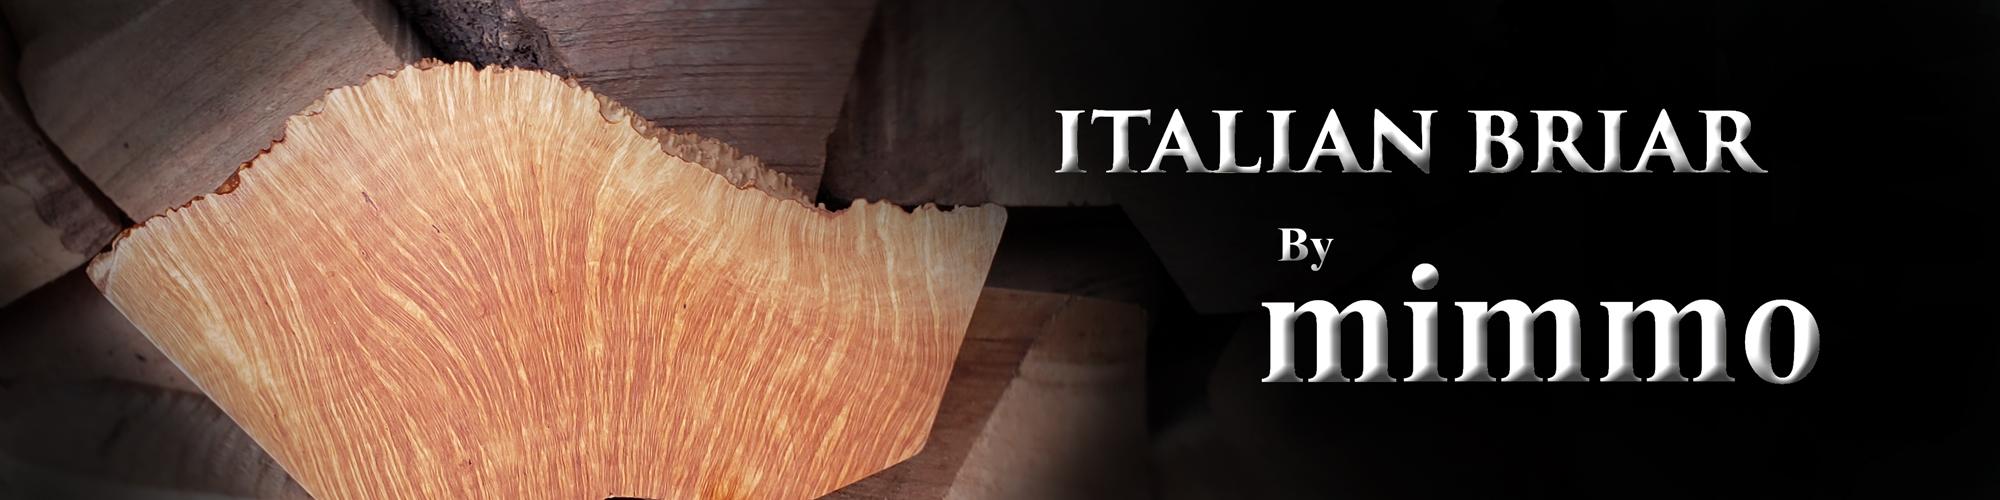 Italian Briar Mimmo